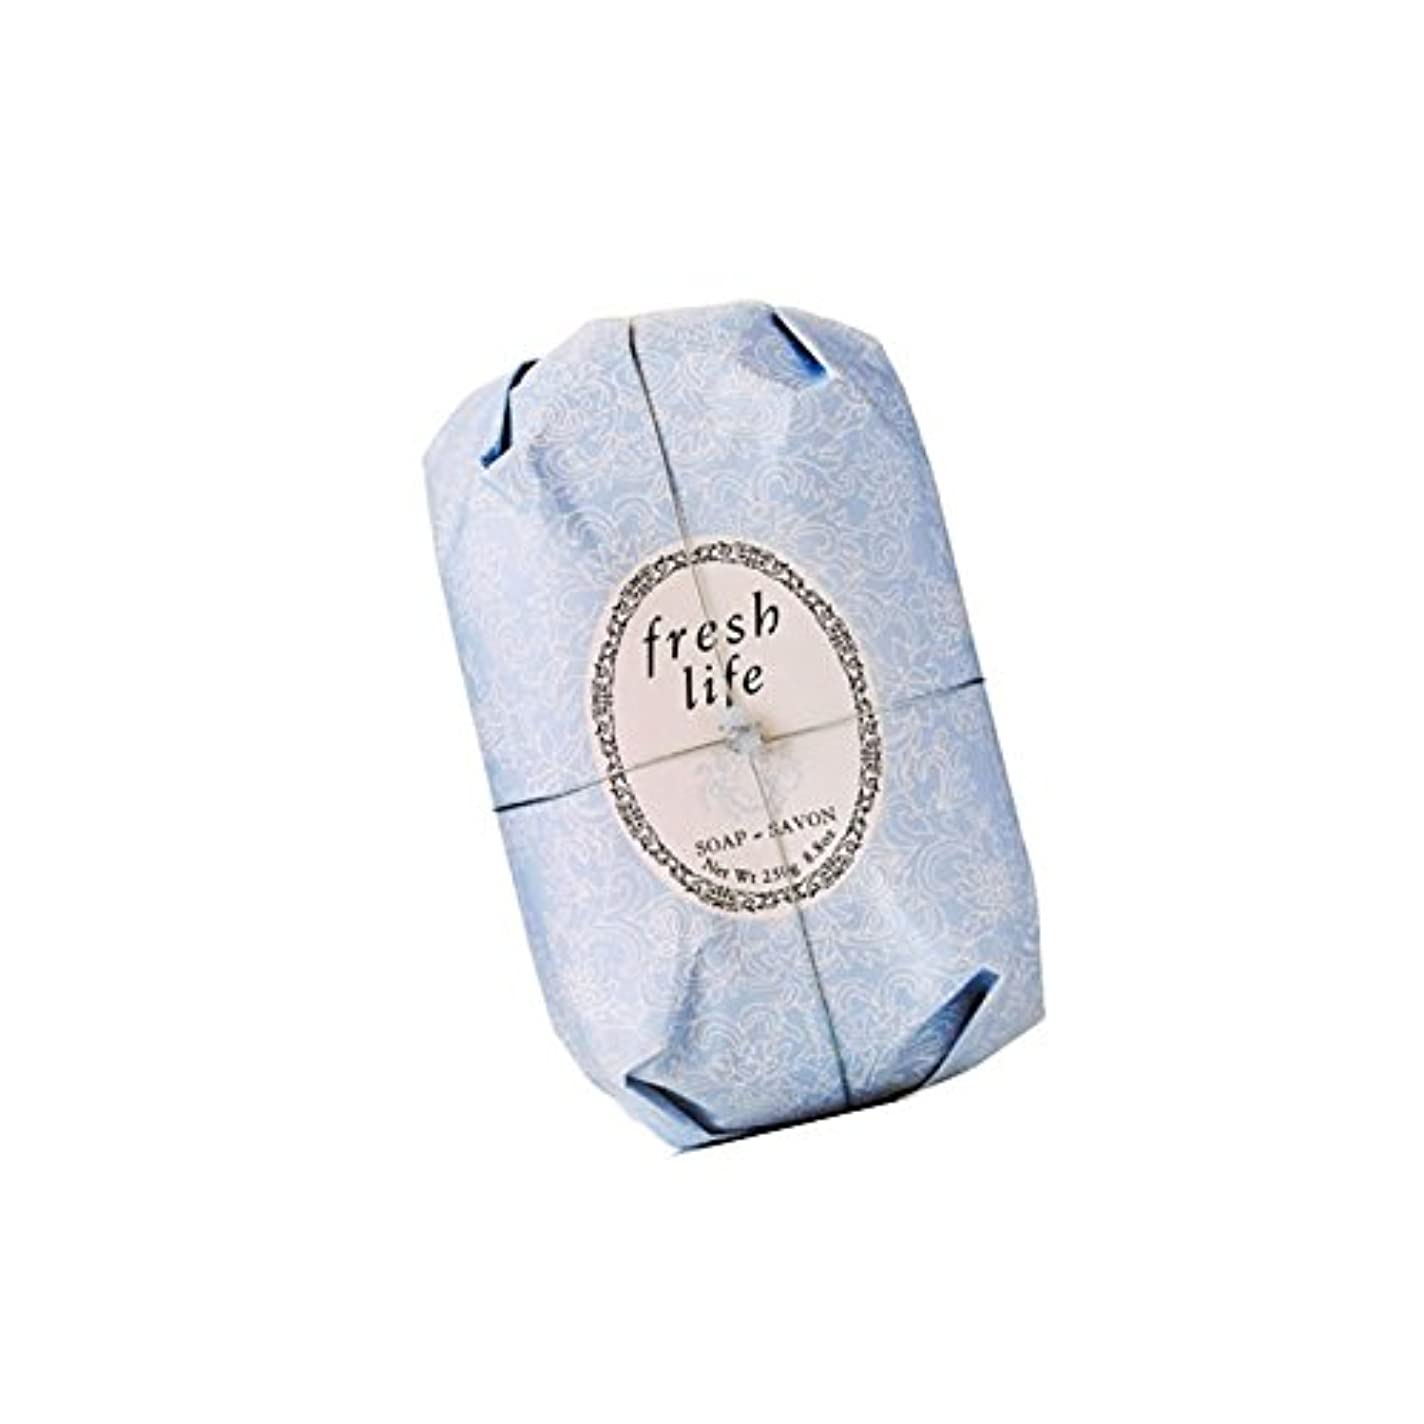 Fresh フレッシュ Life Soap 石鹸, 250g/8.8oz. [海外直送品] [並行輸入品]